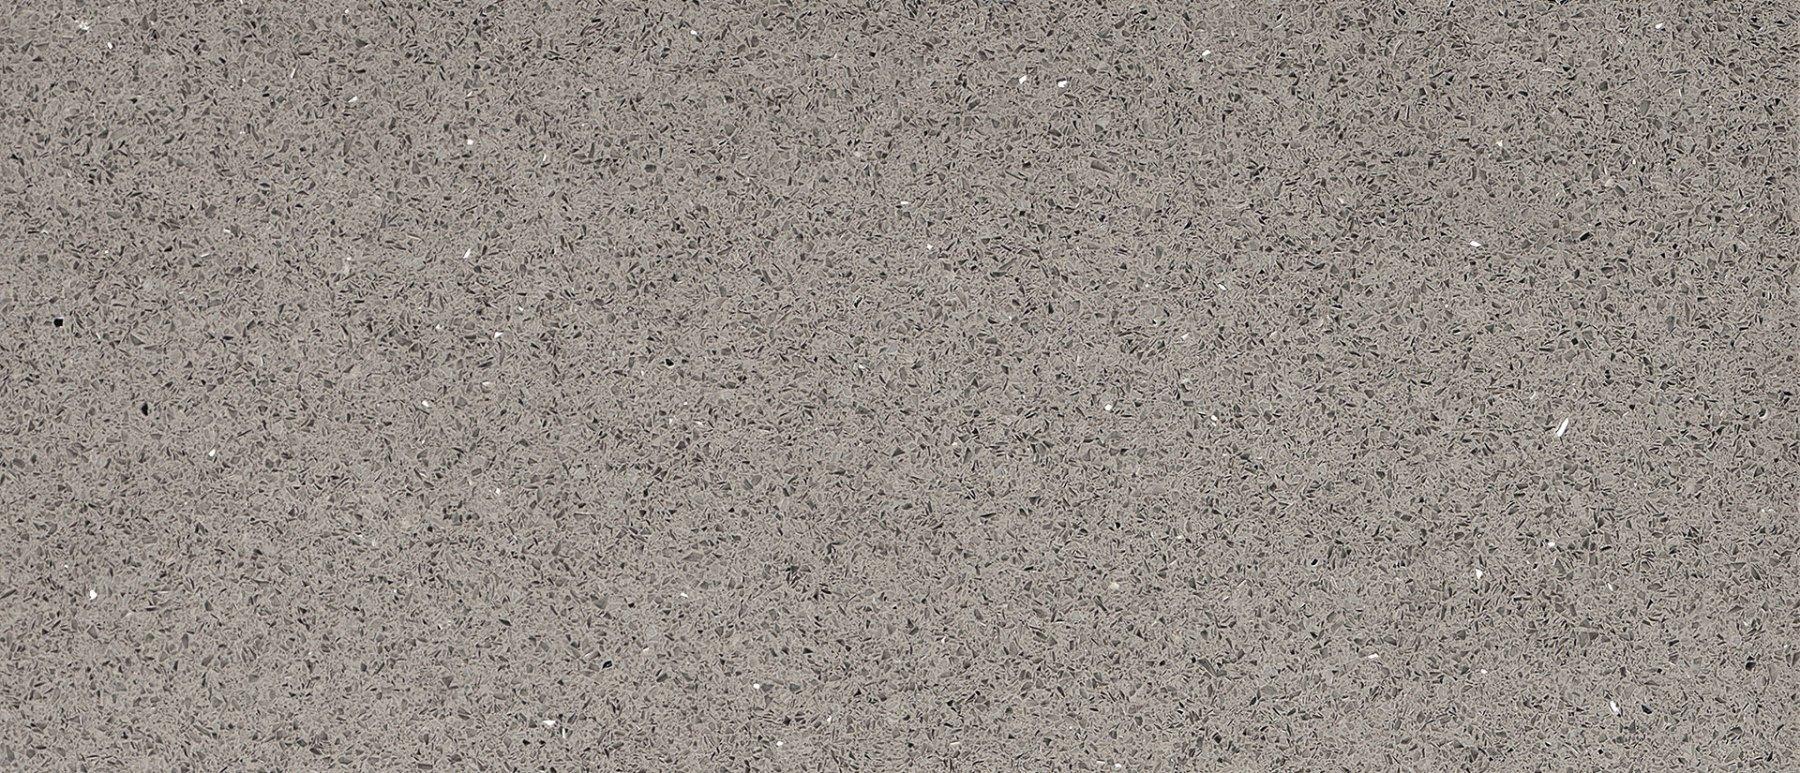 stellar-gray-quartz-1